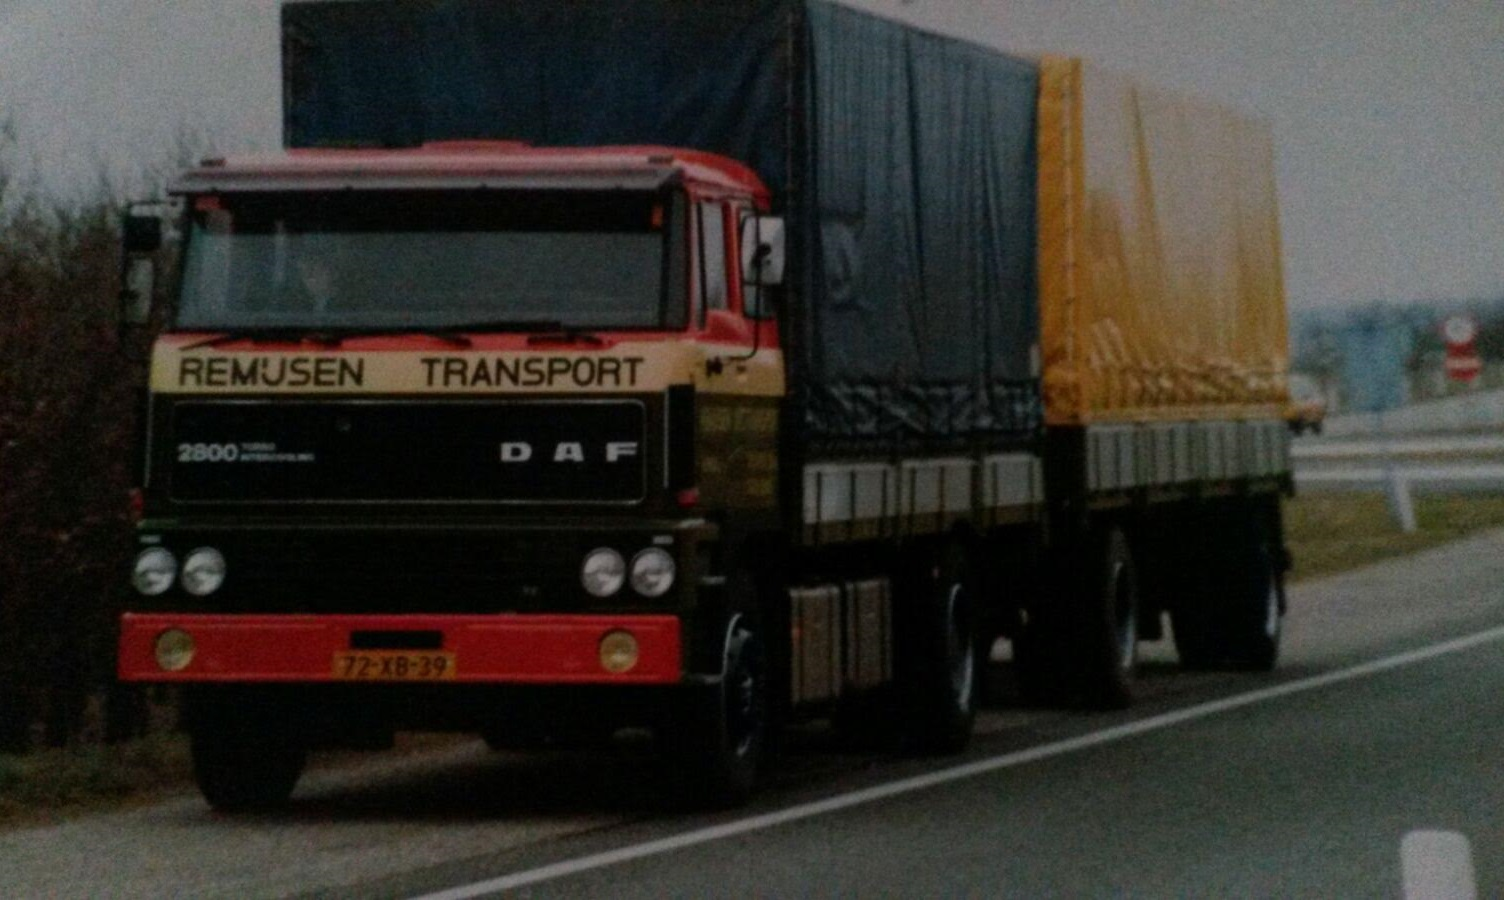 Daf-2800-Joost-Timmermans-